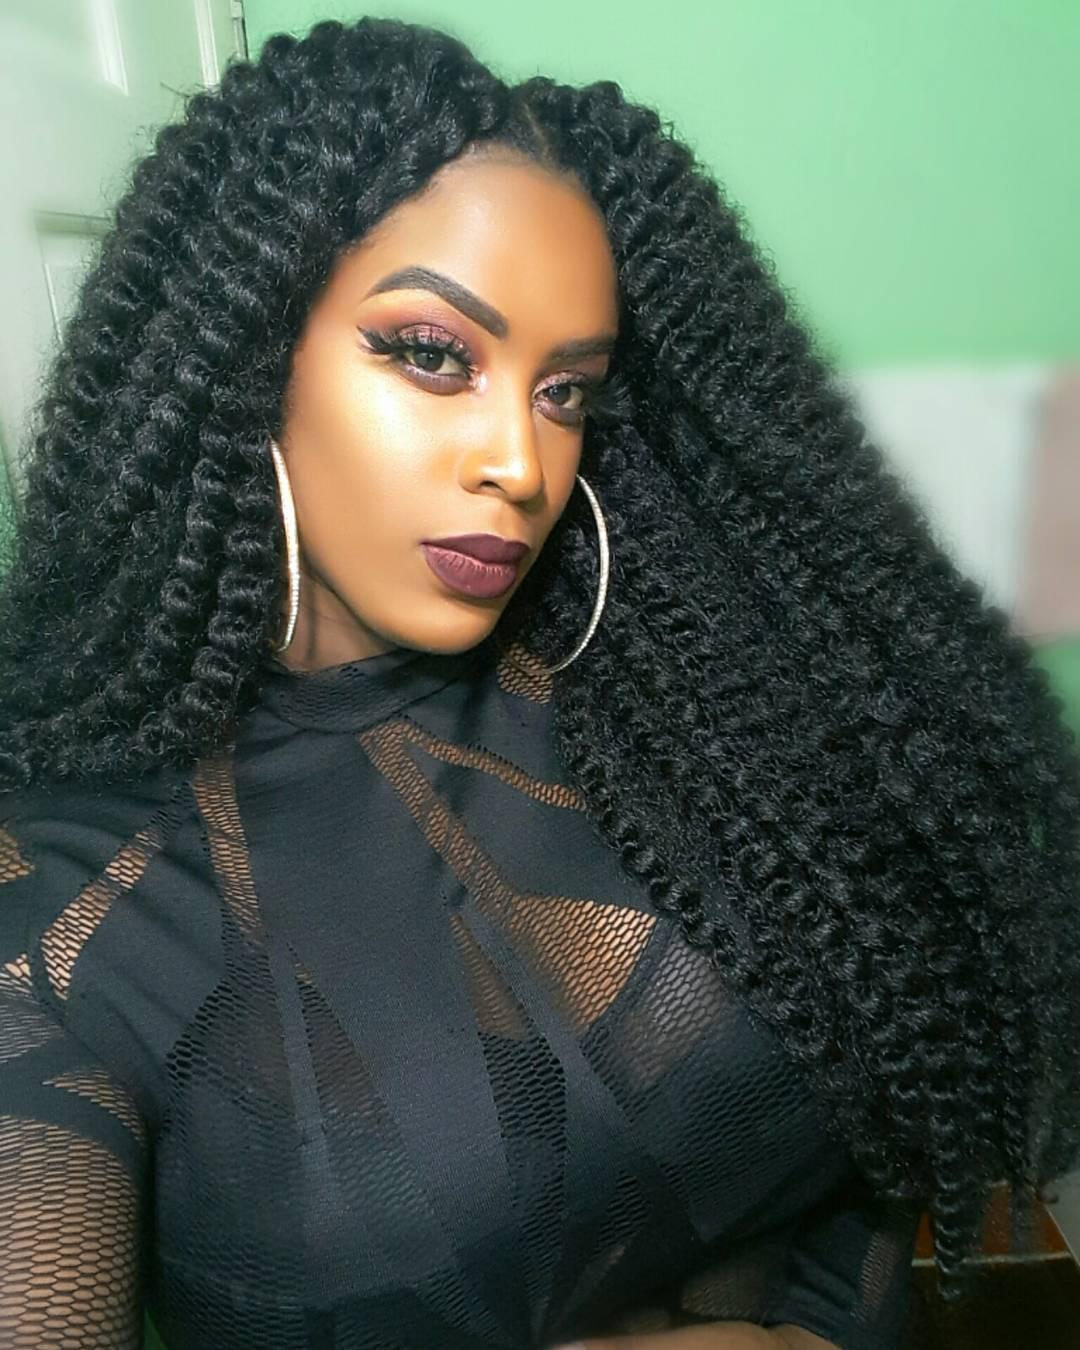 Pics Of Crochet Hairstyles  20 Trendy Crochet Braid Hairstyles